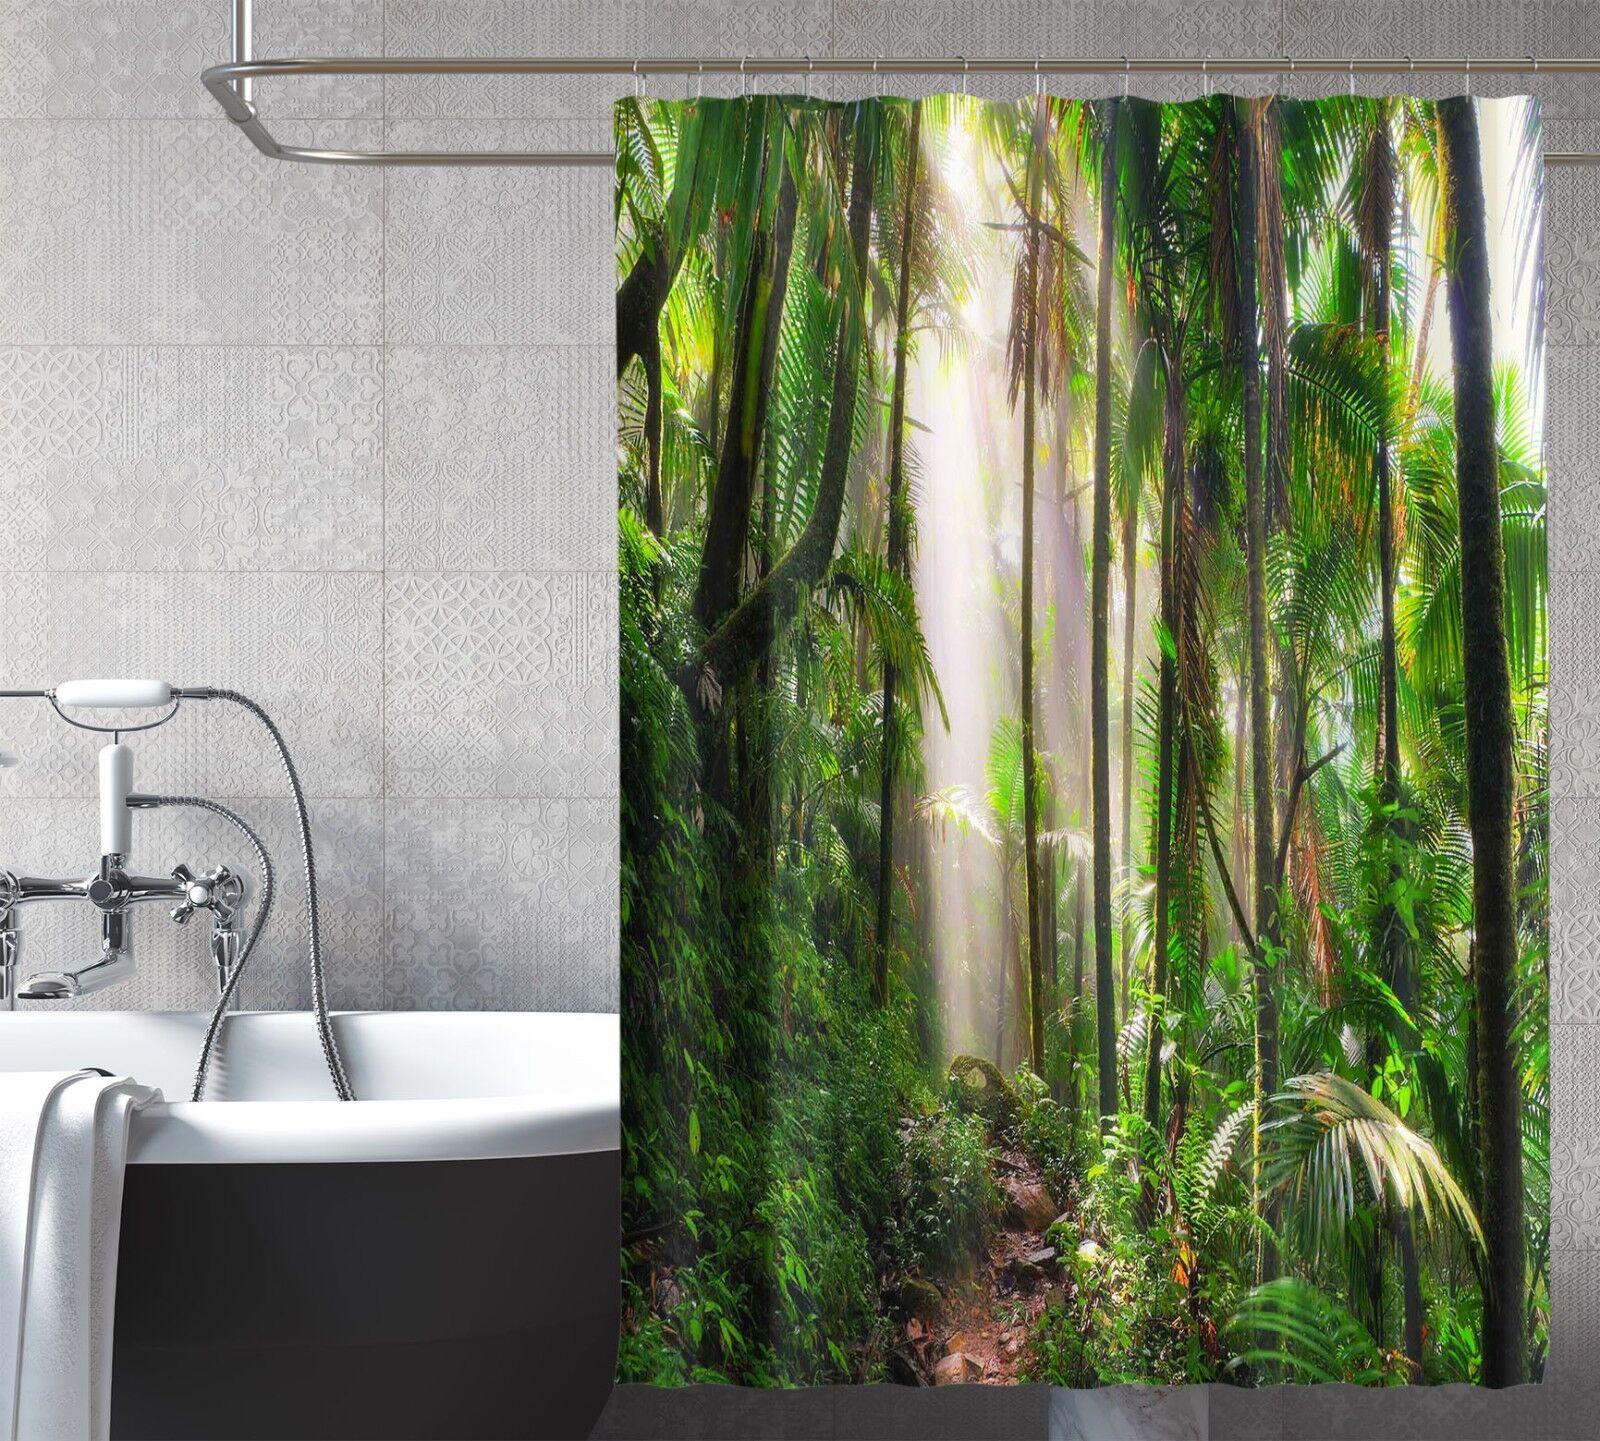 3D Tropical Tree 12 Shower Curtain Waterproof Fiber Bathroom Home Windows Toilet D819d8